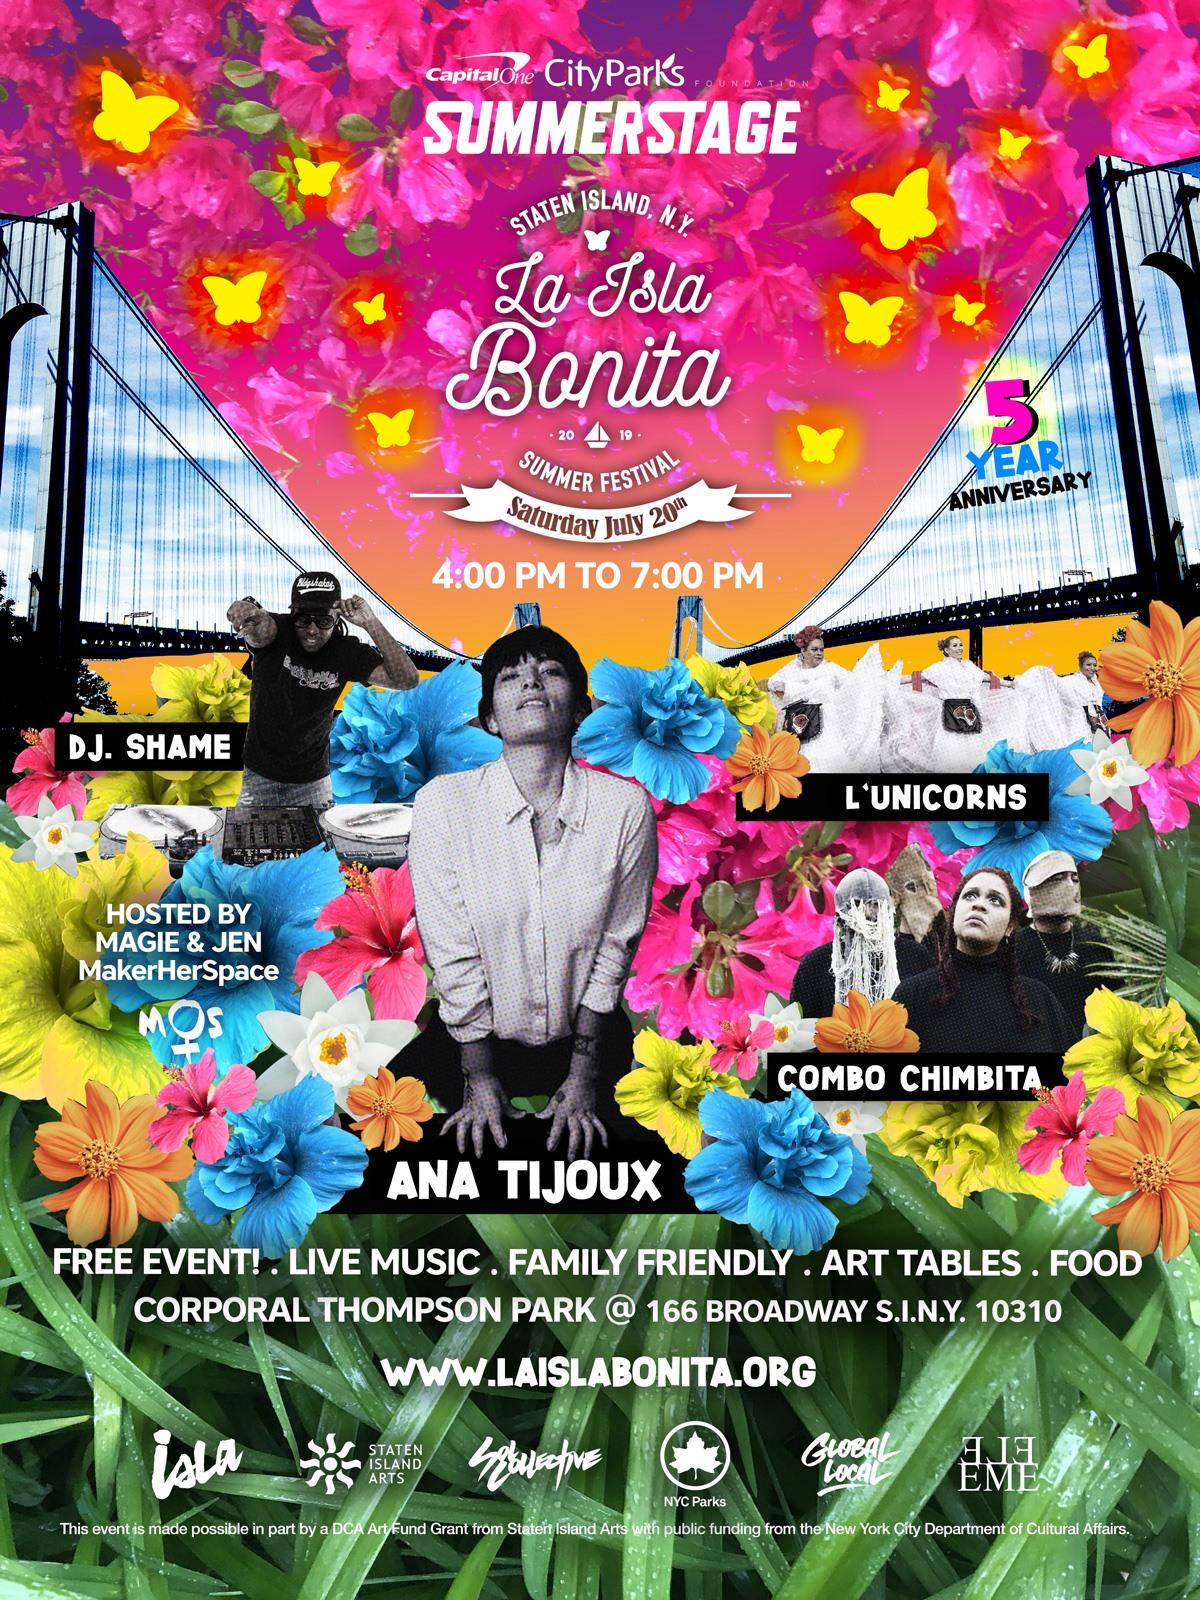 La Isla Bonita Festival 5th Anniversary!